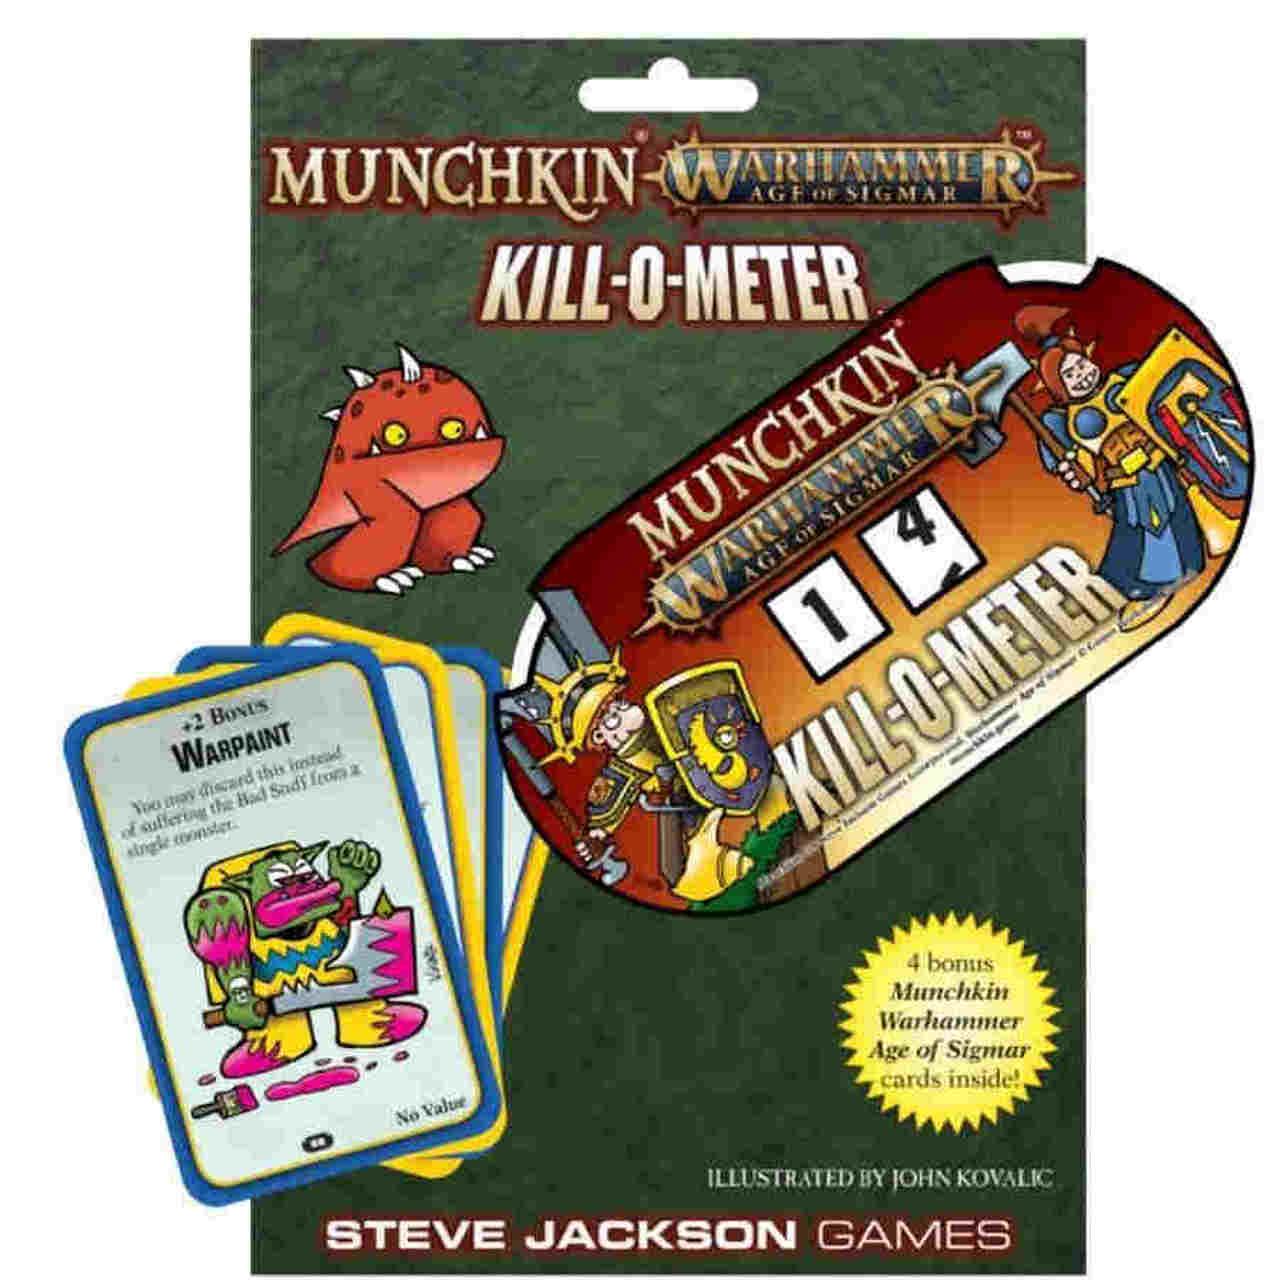 Munchkin Warhammer AOS - Kill-O-Meter